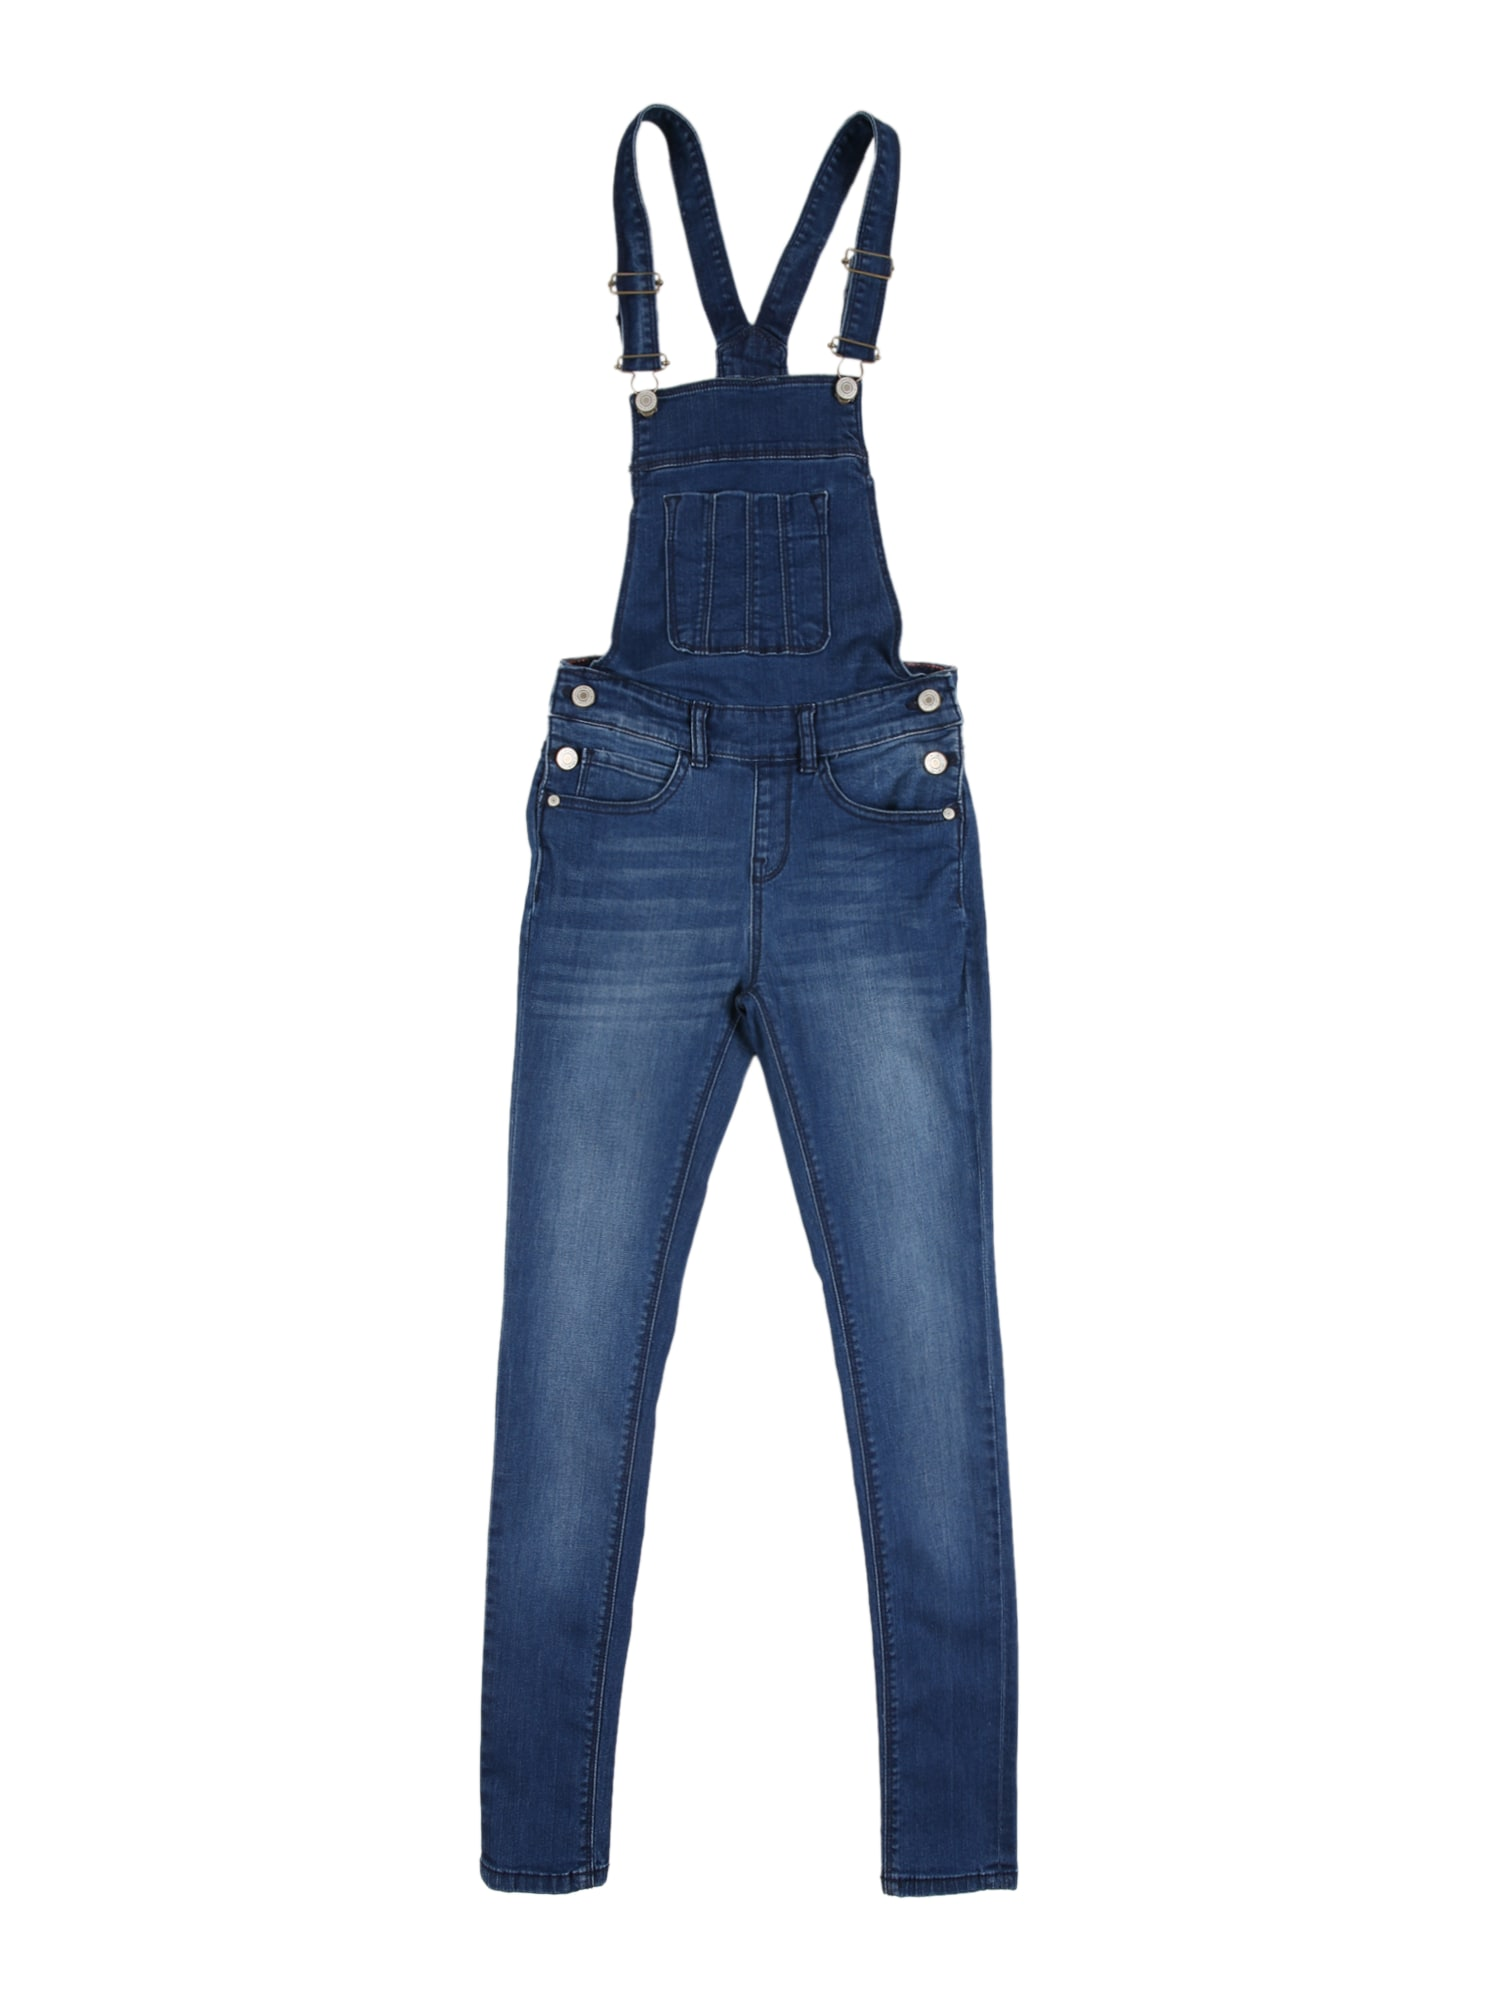 Cars Jeans Kombinezonas su petnešomis